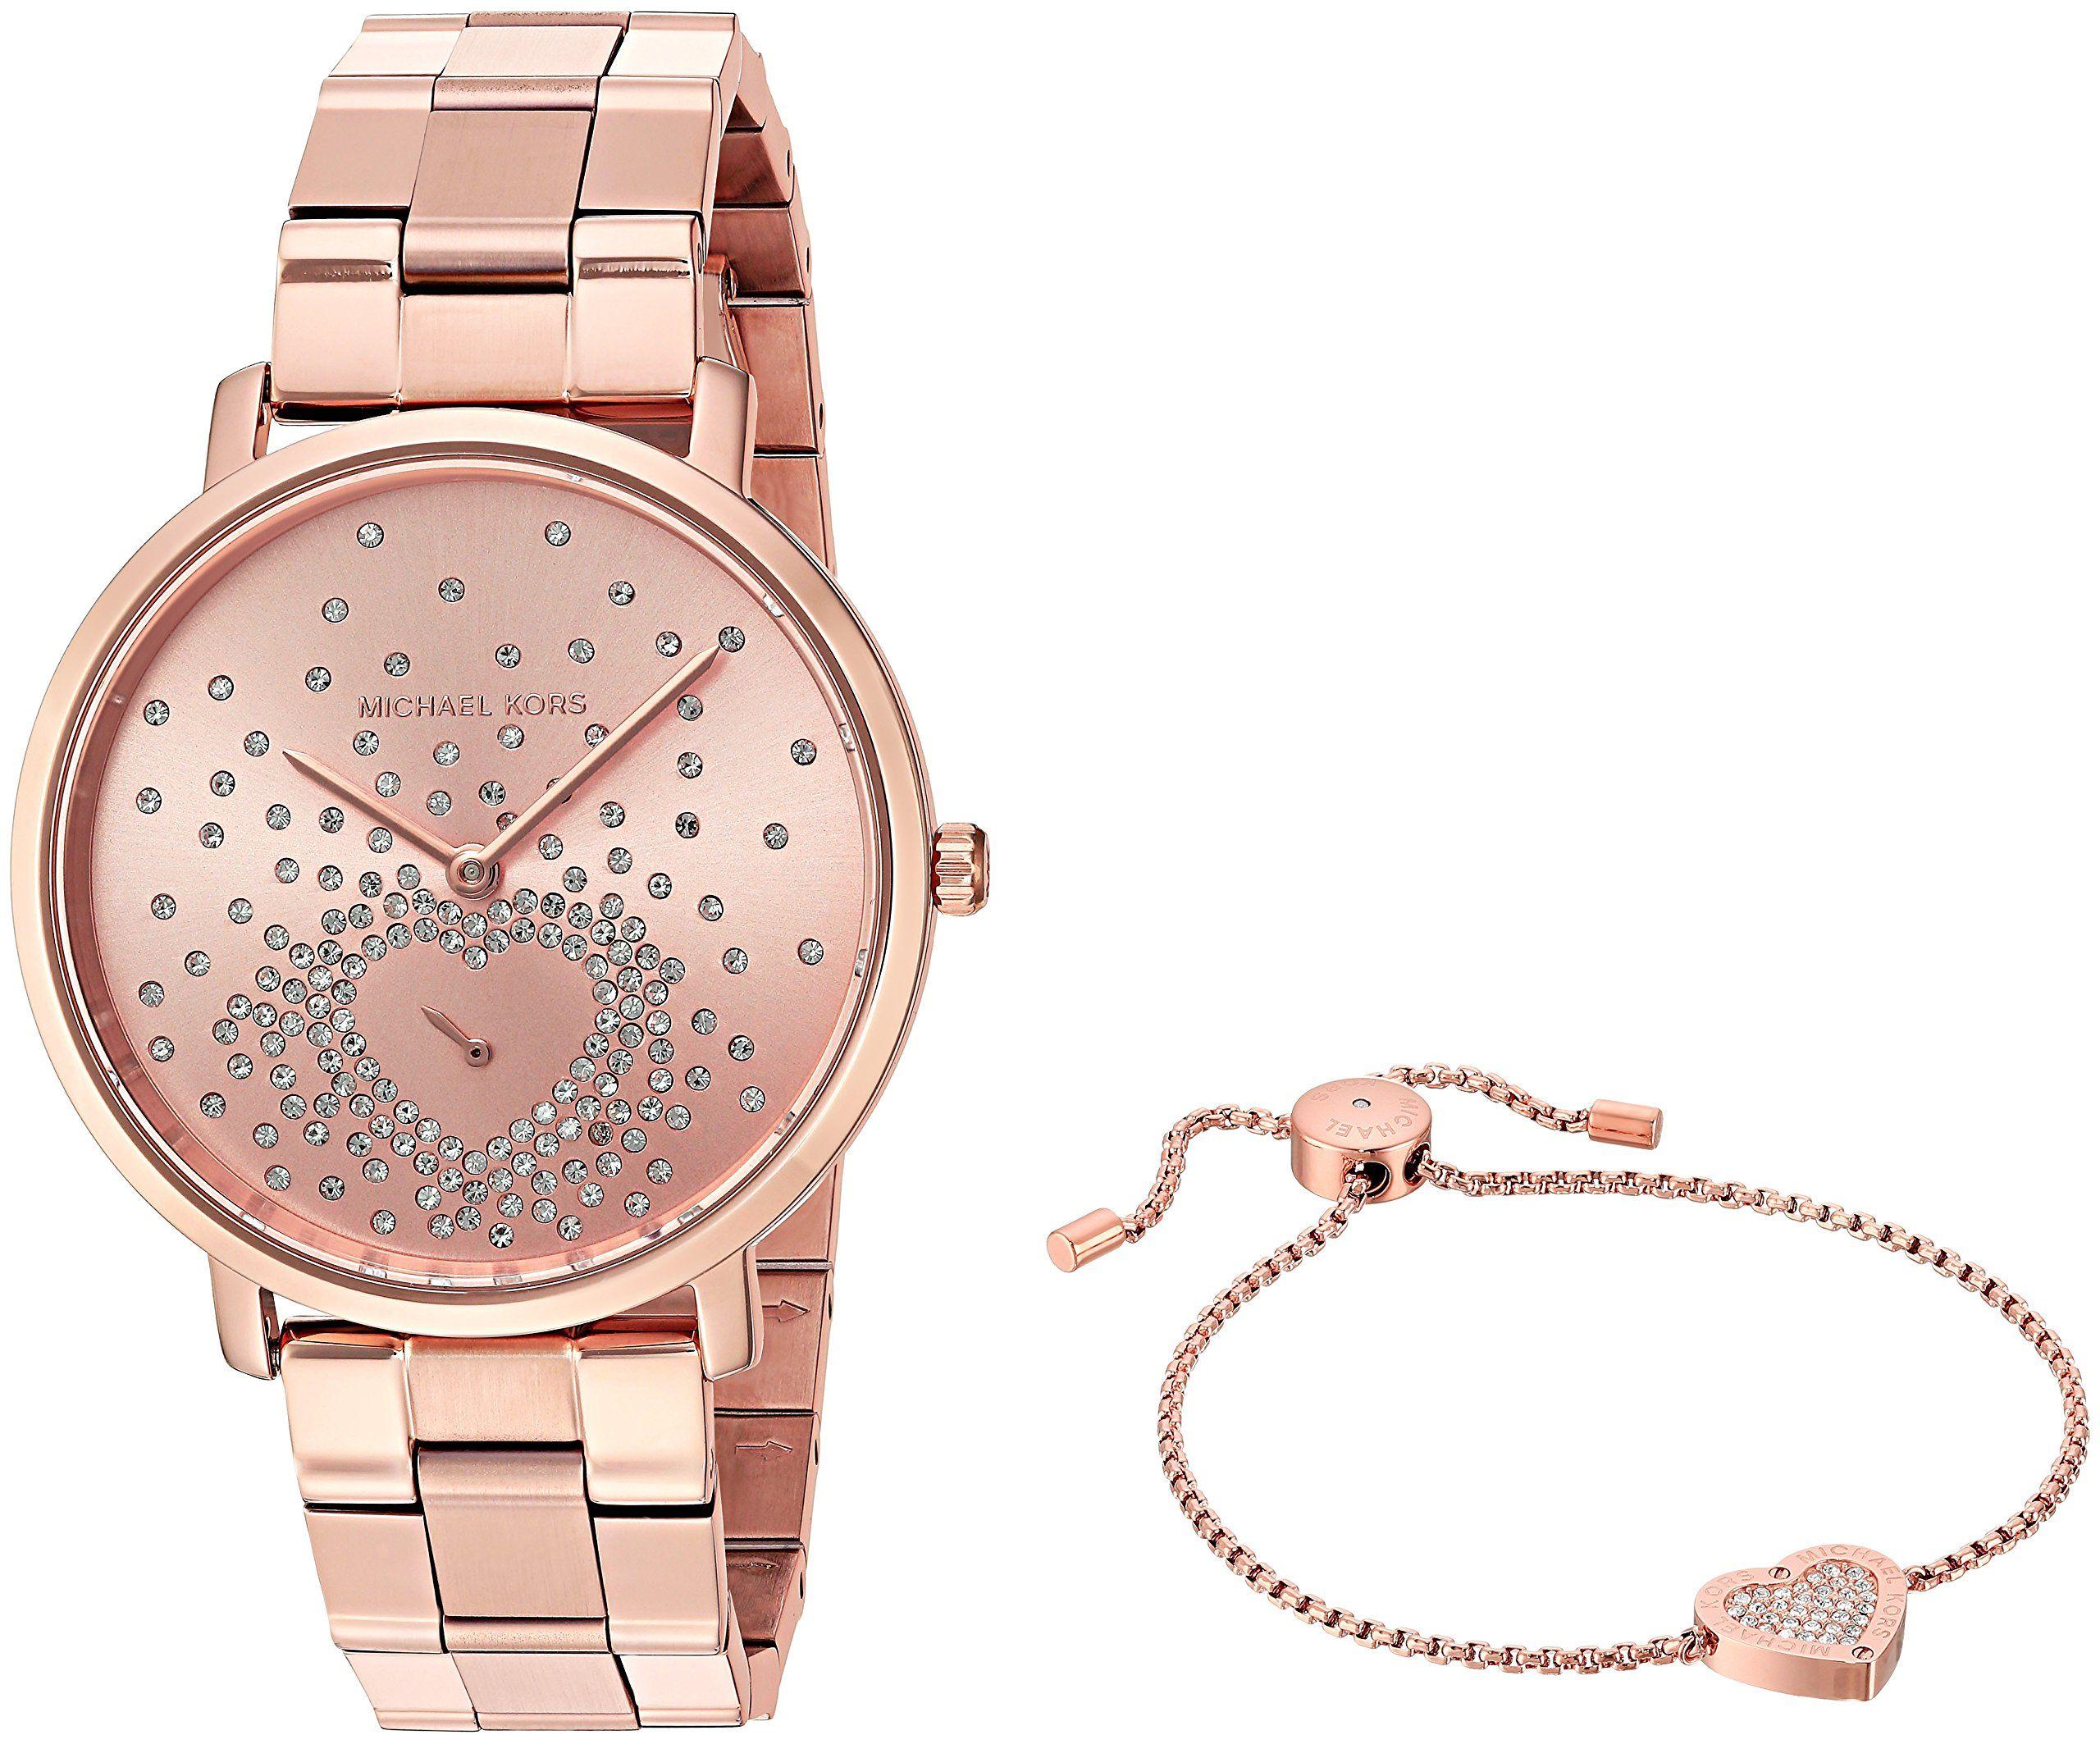 Michael Kors Women's Jaryn Rose Gold-Tone Watch MK3621